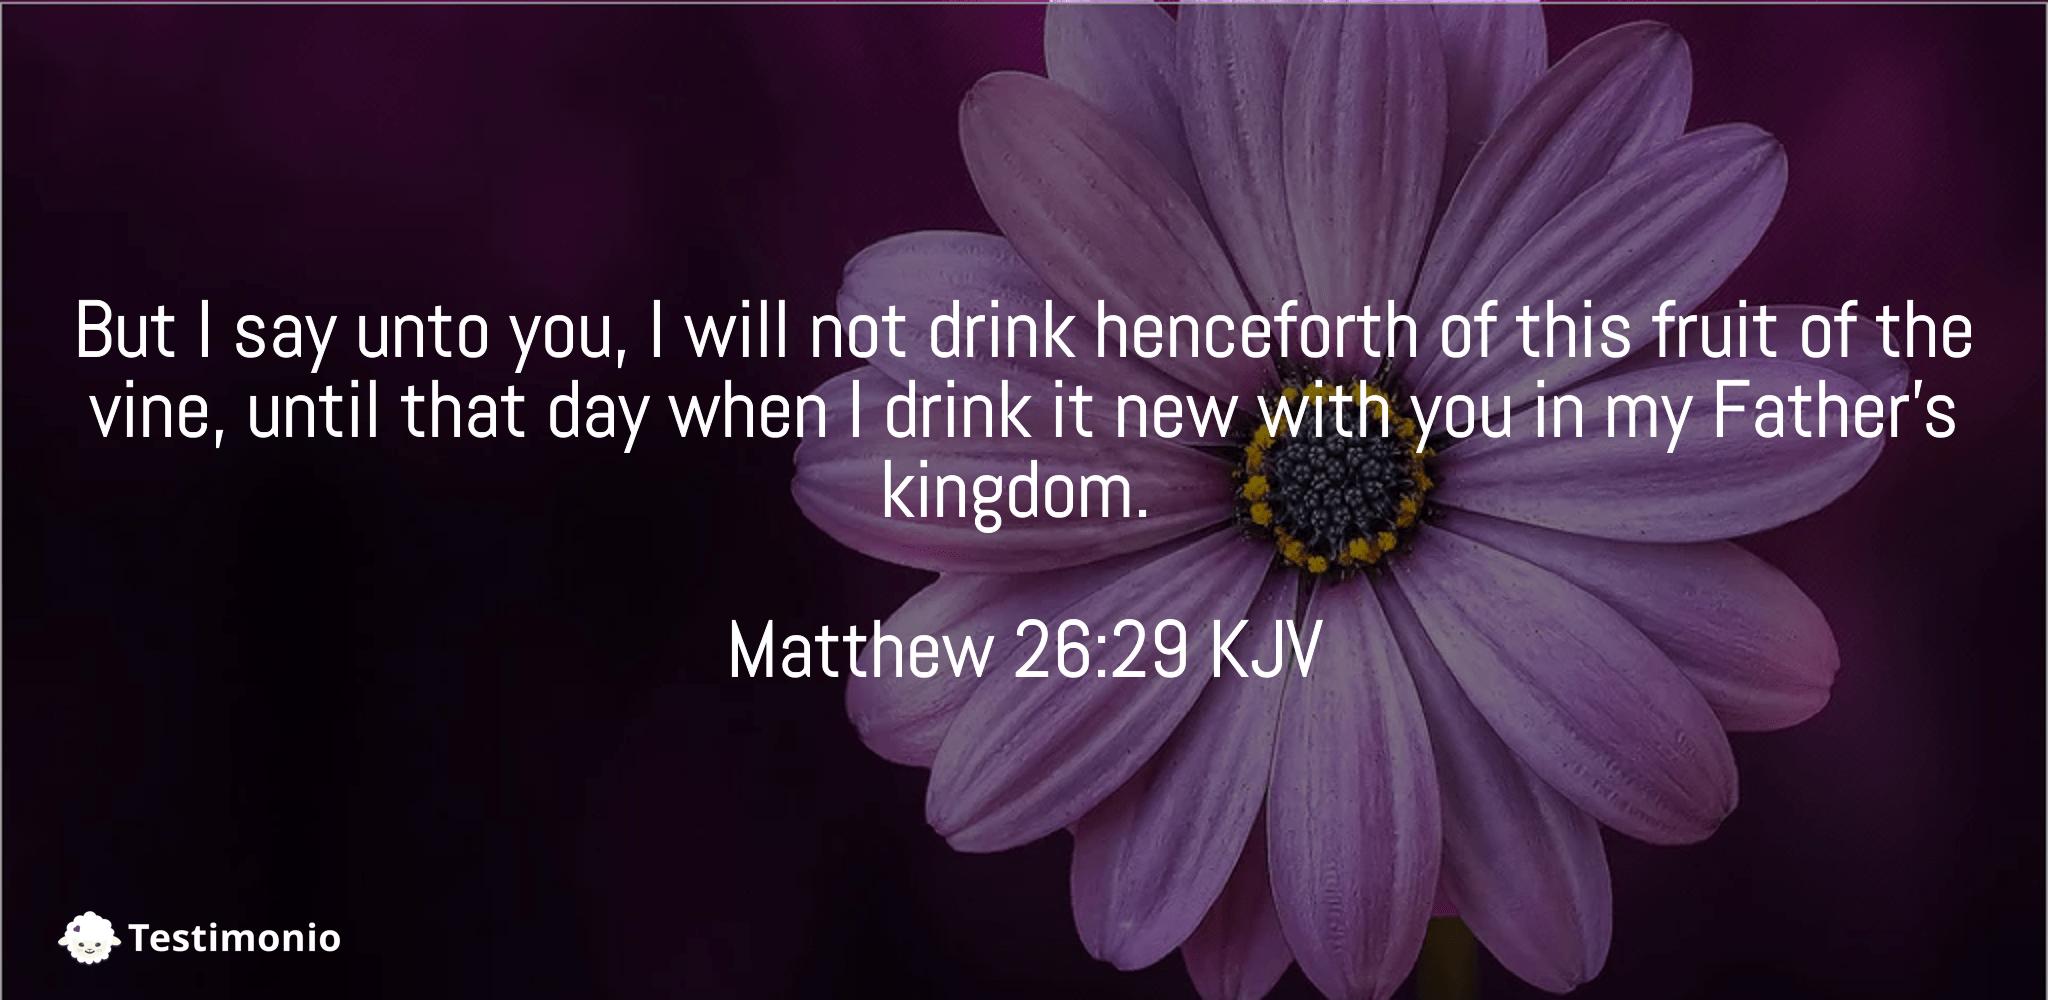 Matthew 26:29